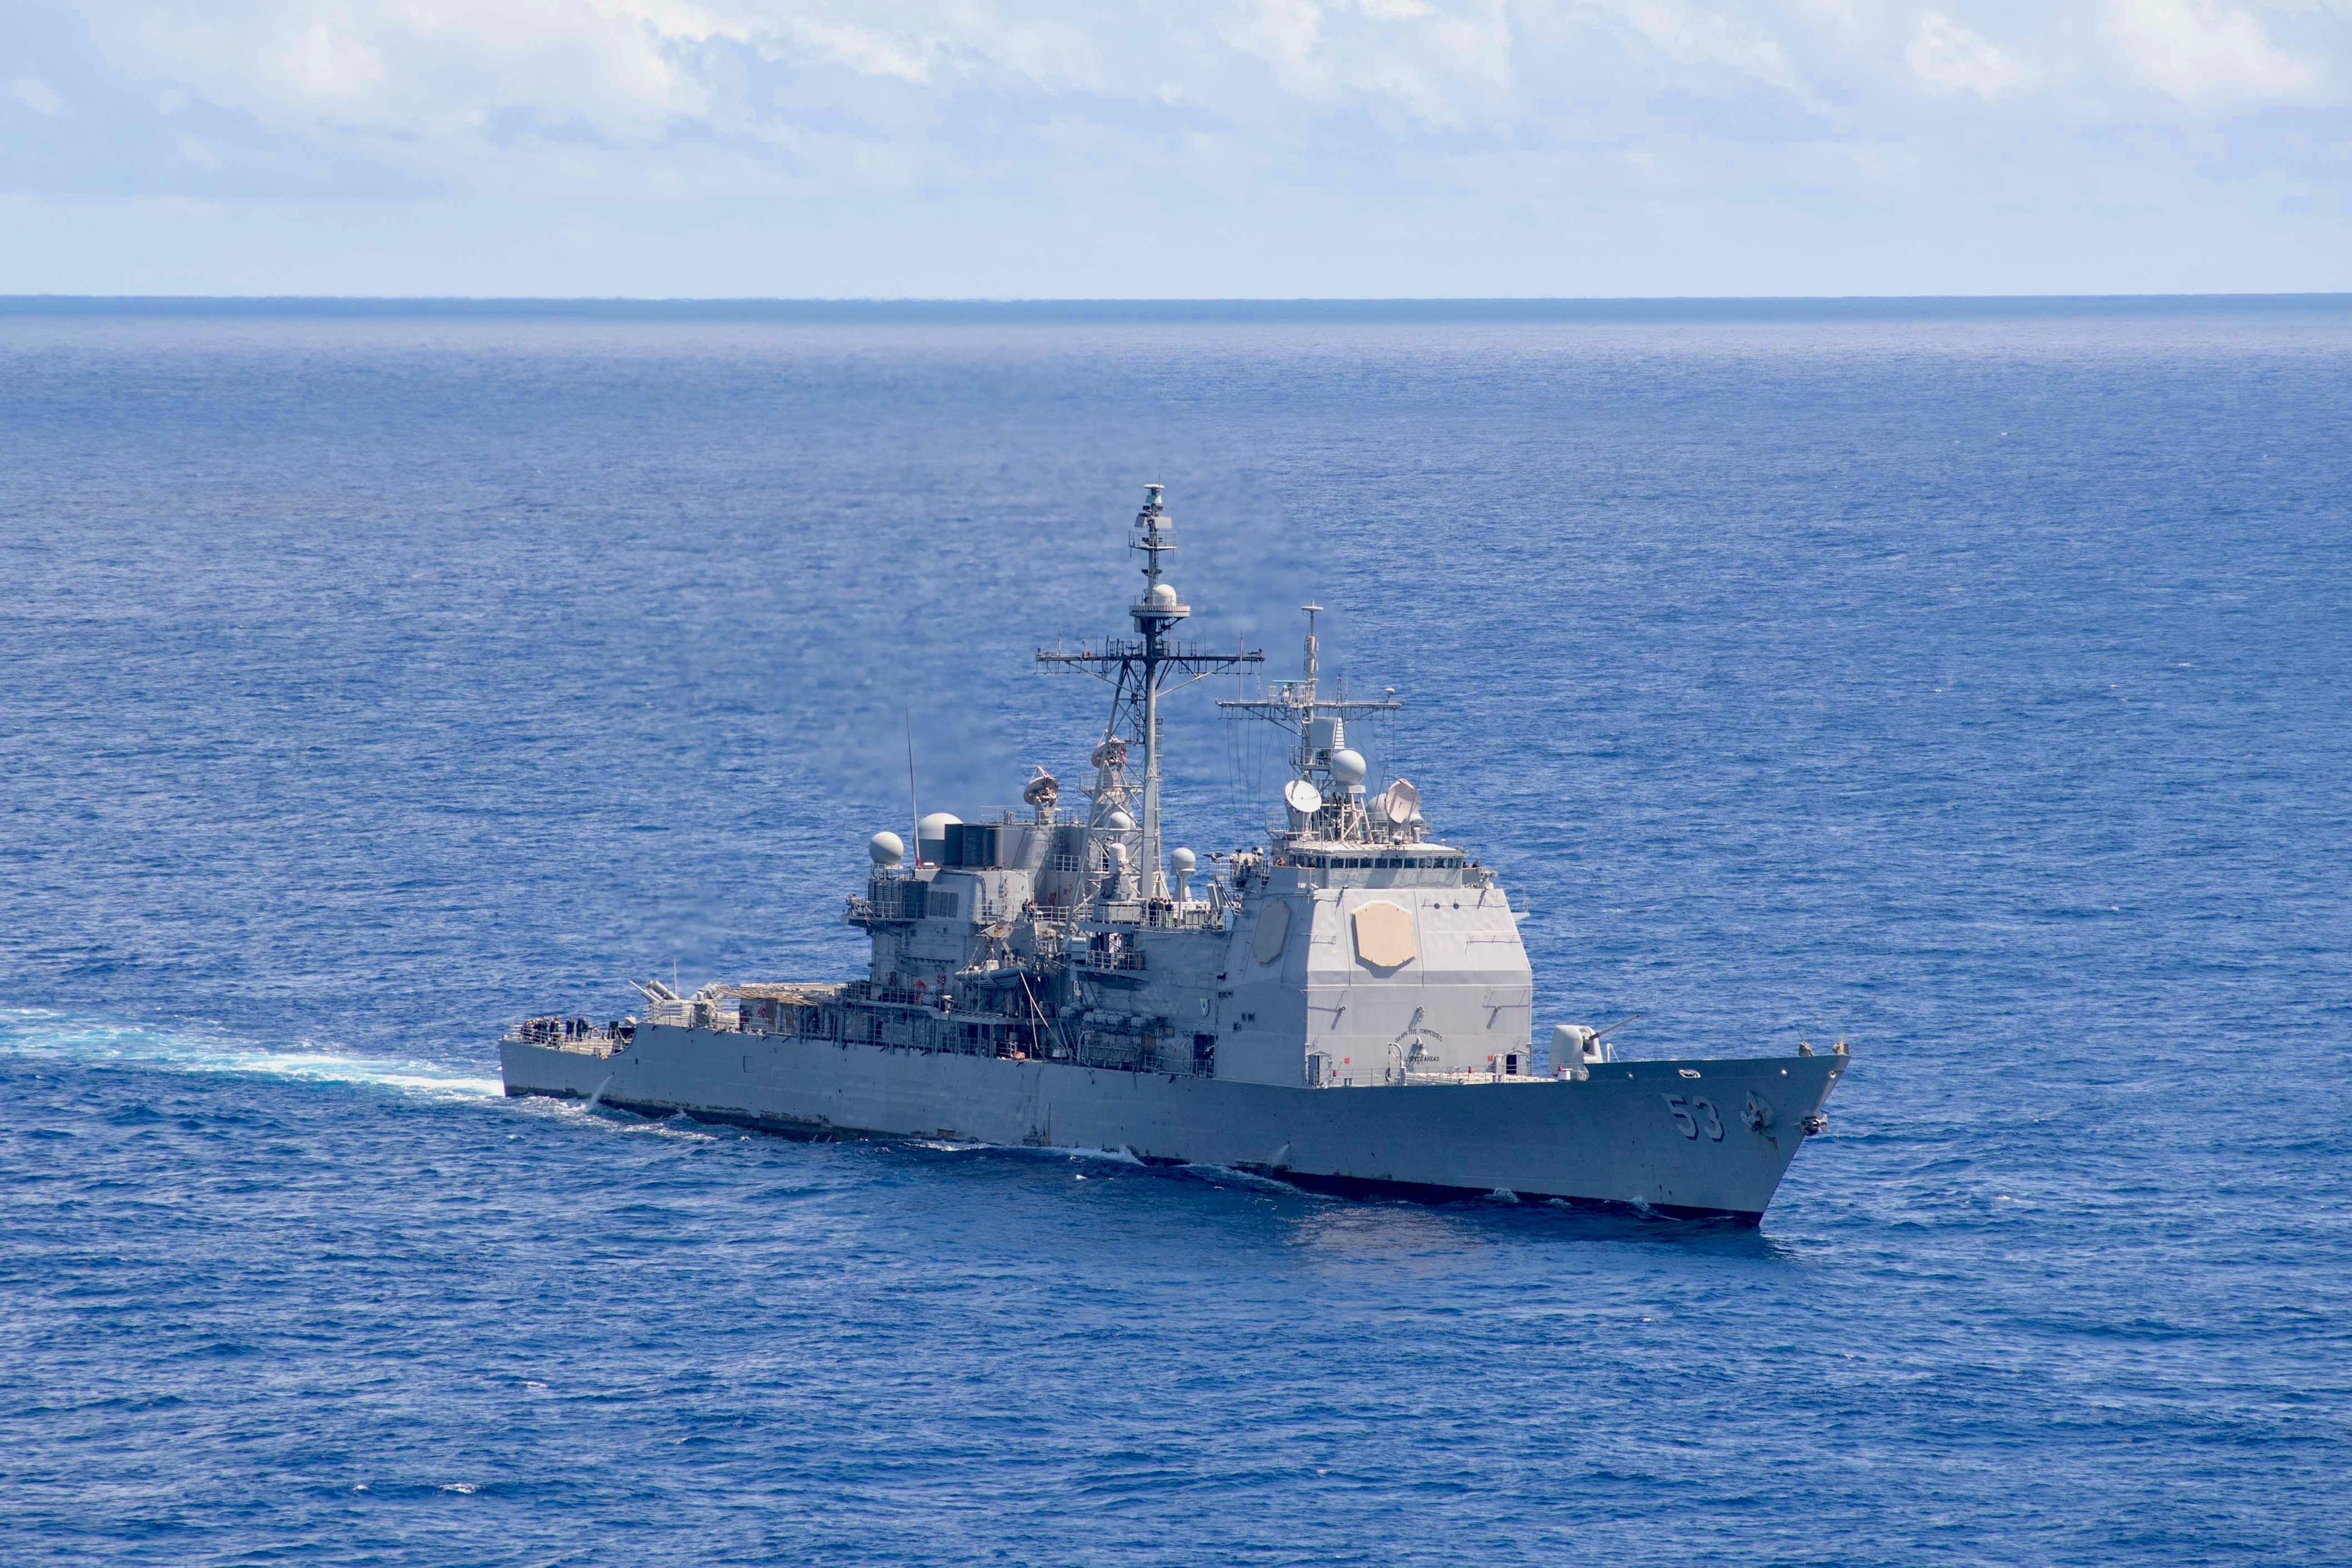 USNI News Fleet And Marine Tracker: May 13, 2019